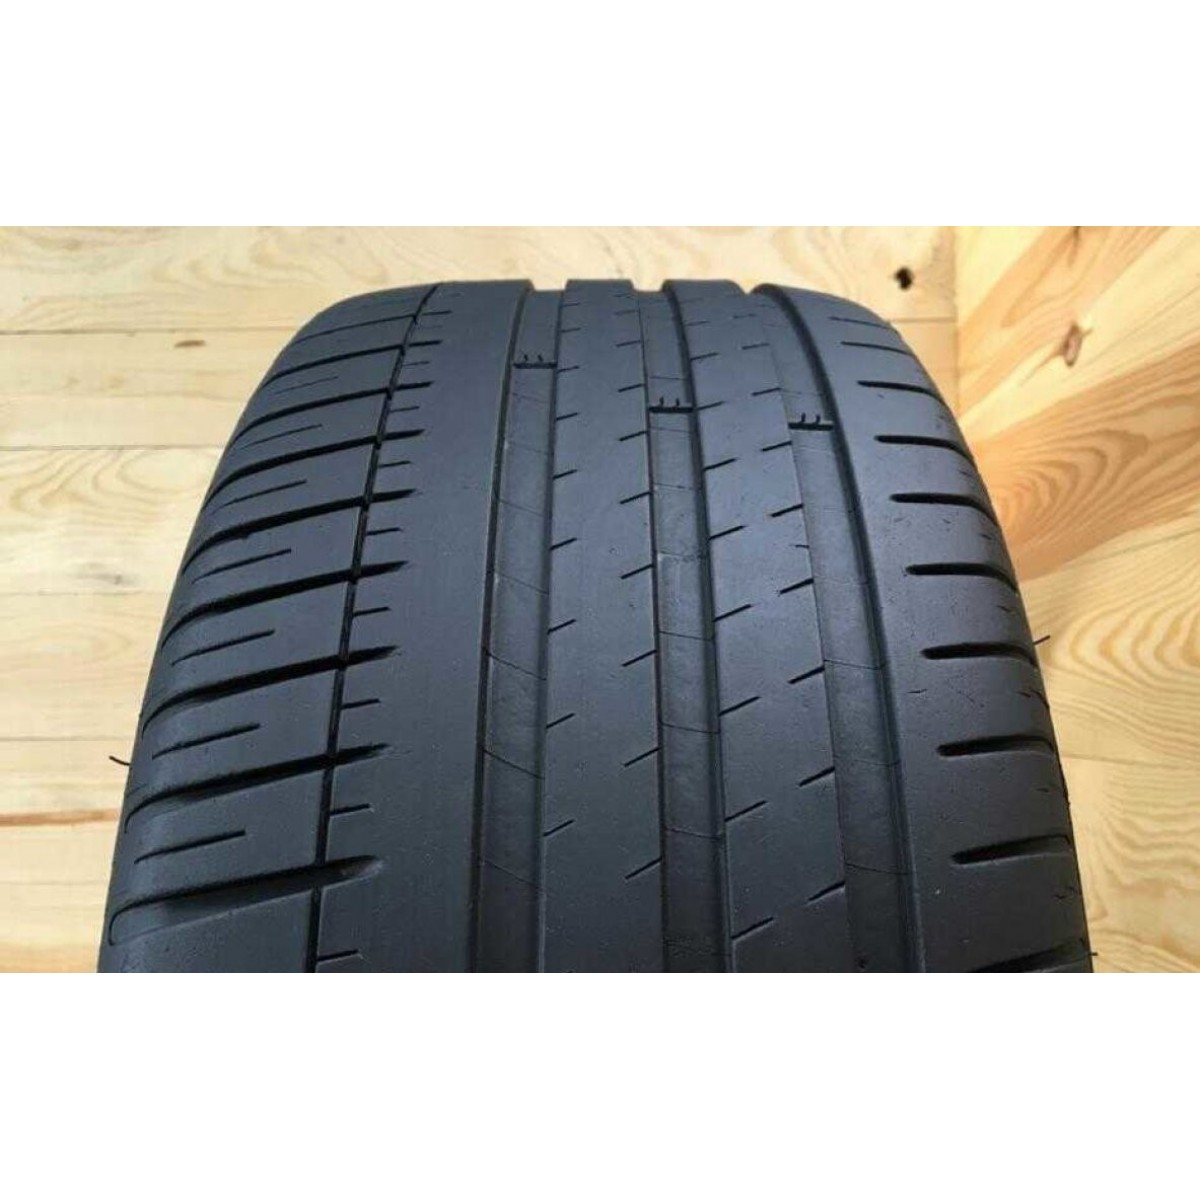 215/45R18 Michelin Pilot Sport 3